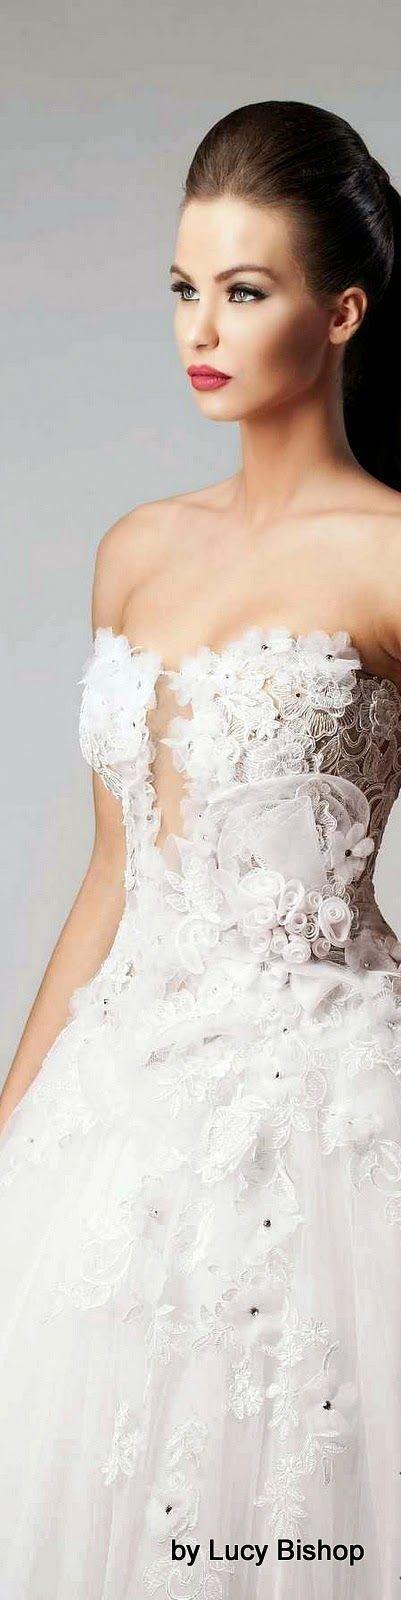 Tendance Robe De Mariée 2017/ 2018 : Hanna Toumajean Fall Winter 2014/15 www.wedding-dress......